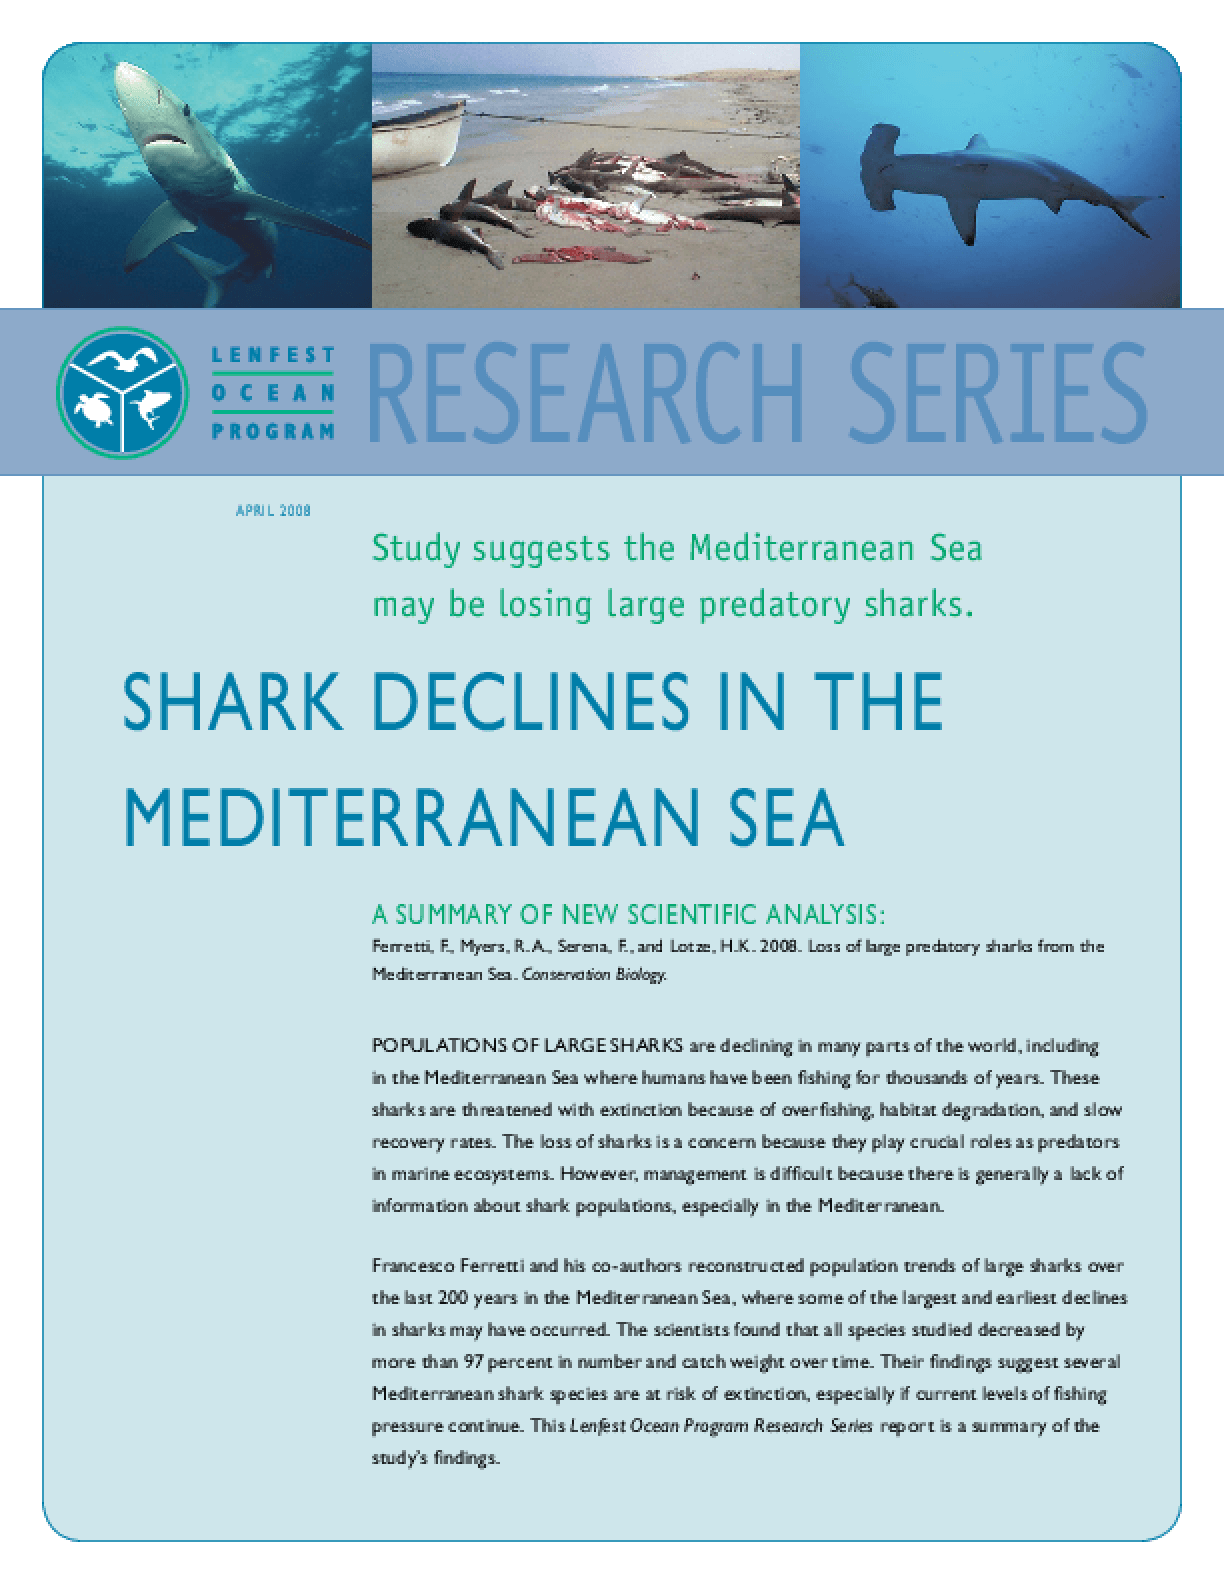 Shark Declines in the Mediterranean Sea